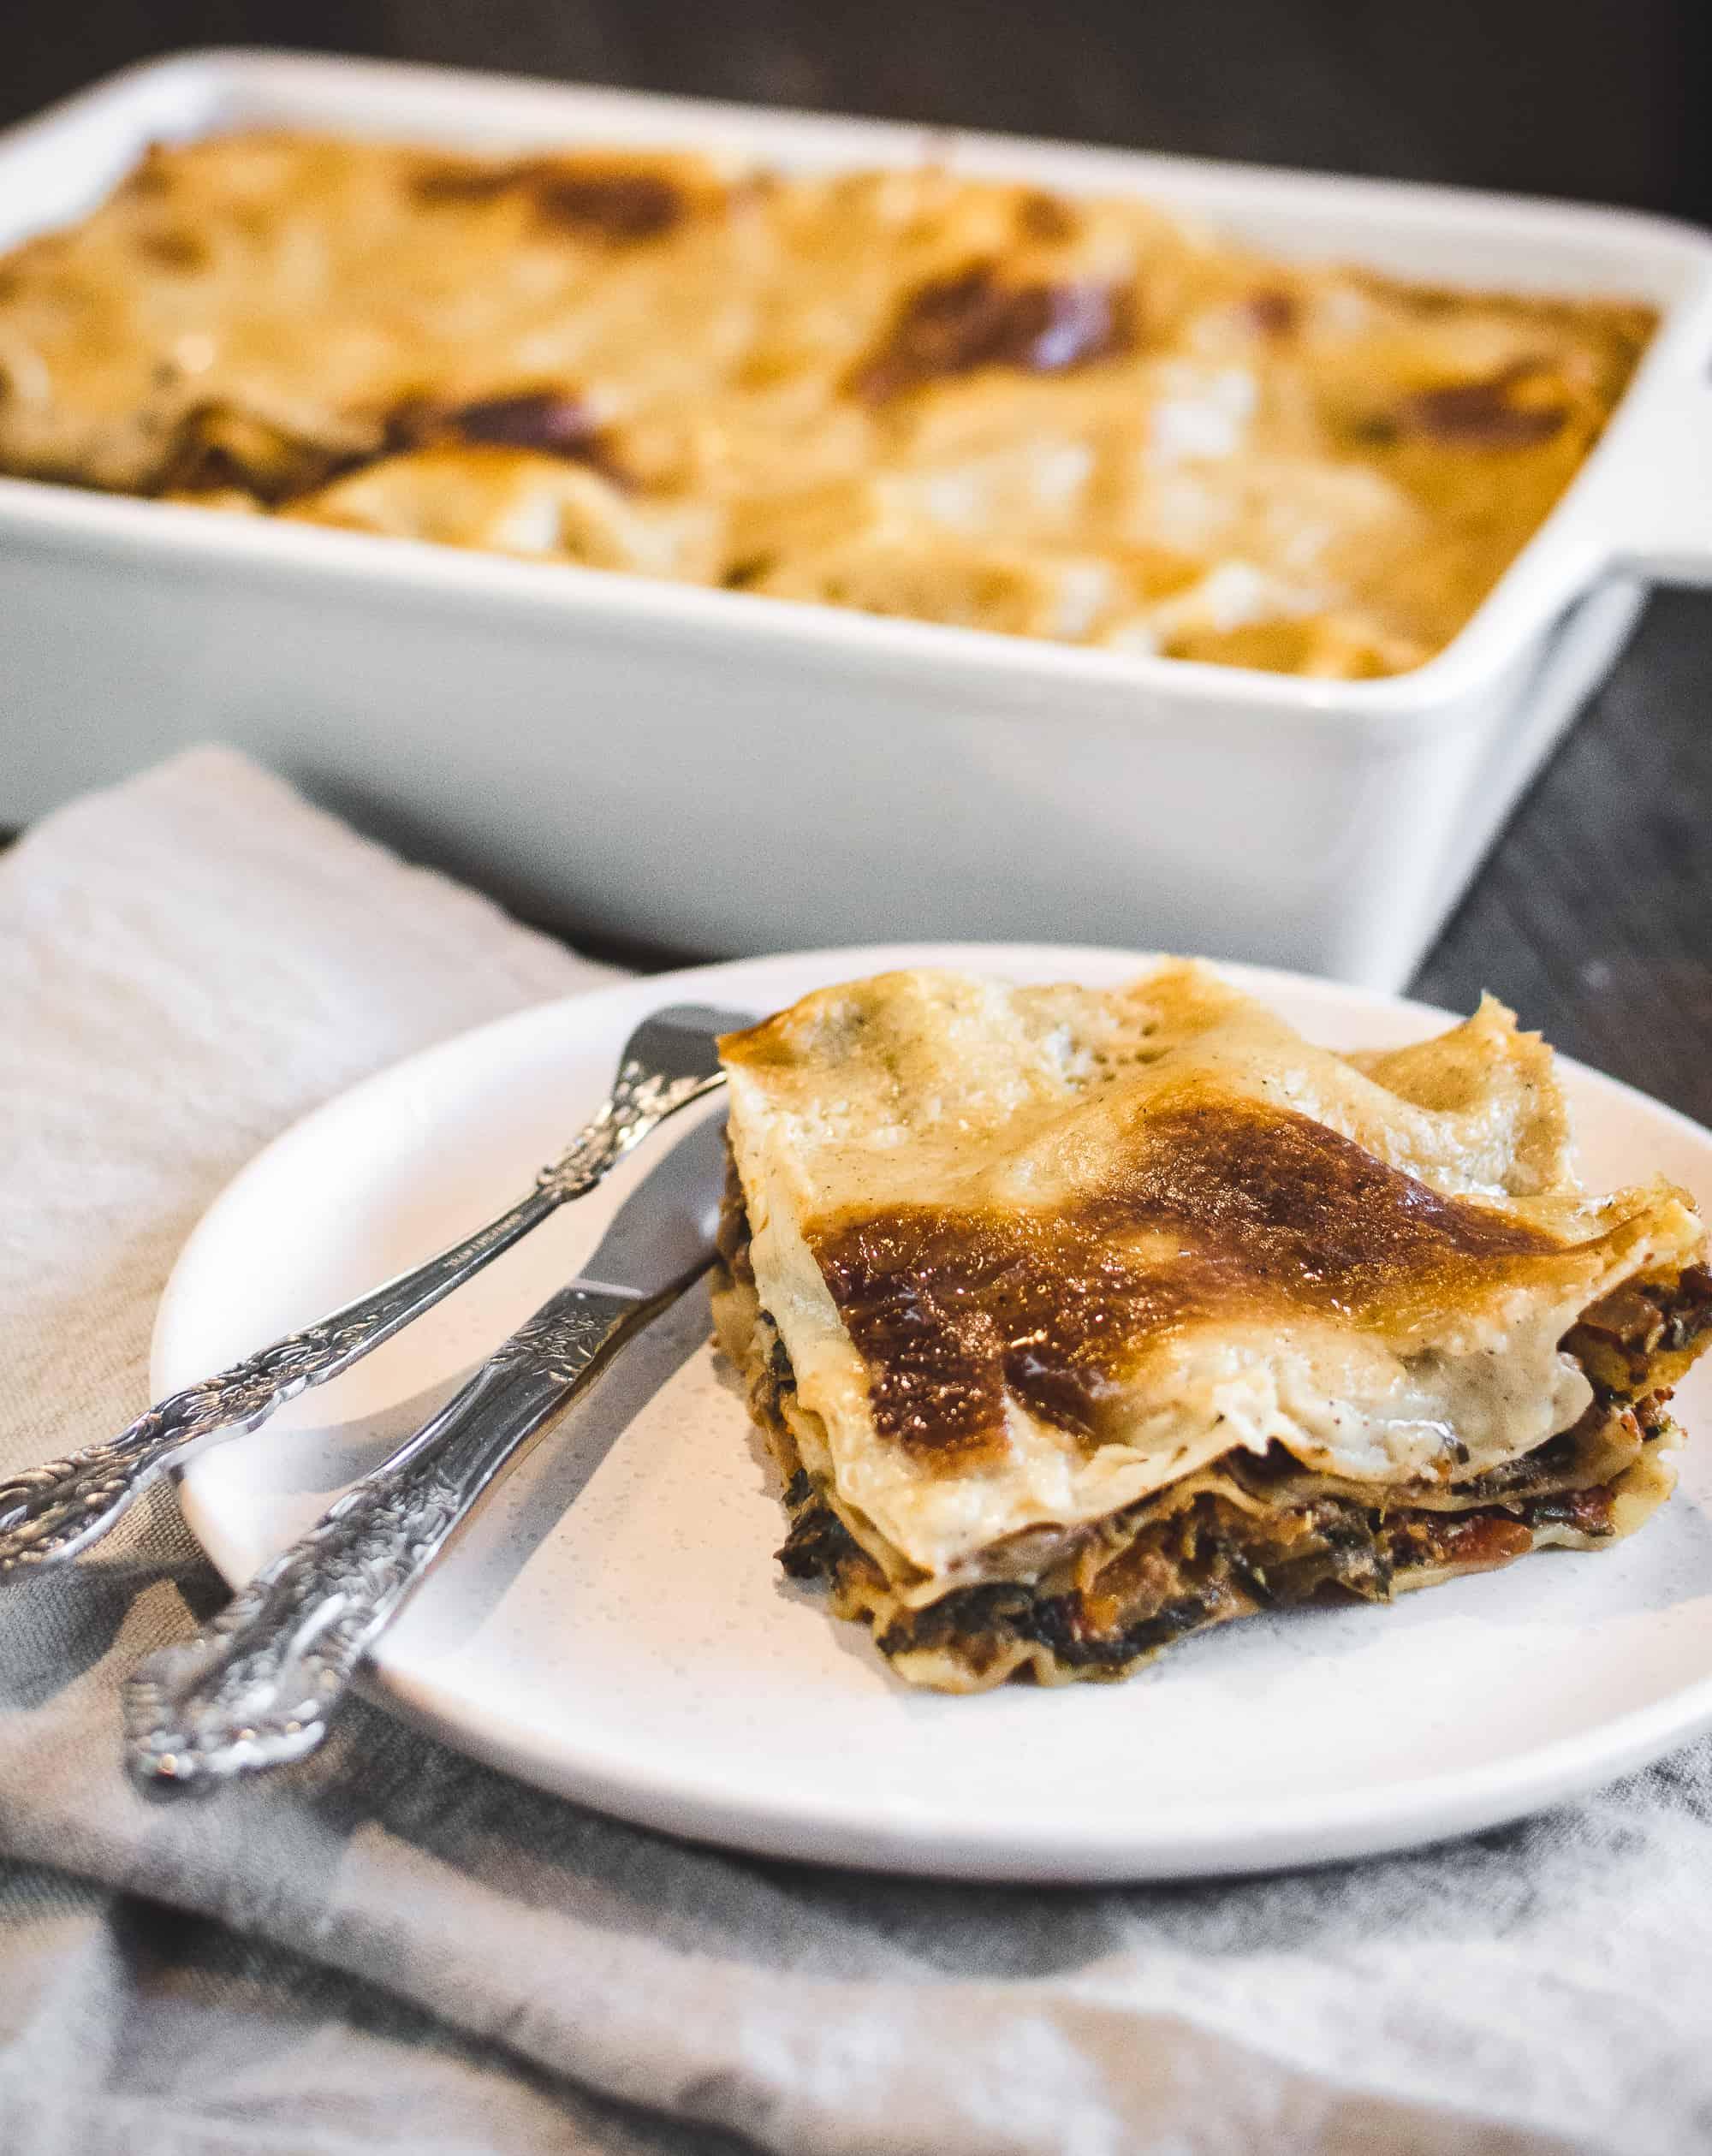 Vegan lentil spinach lasagna